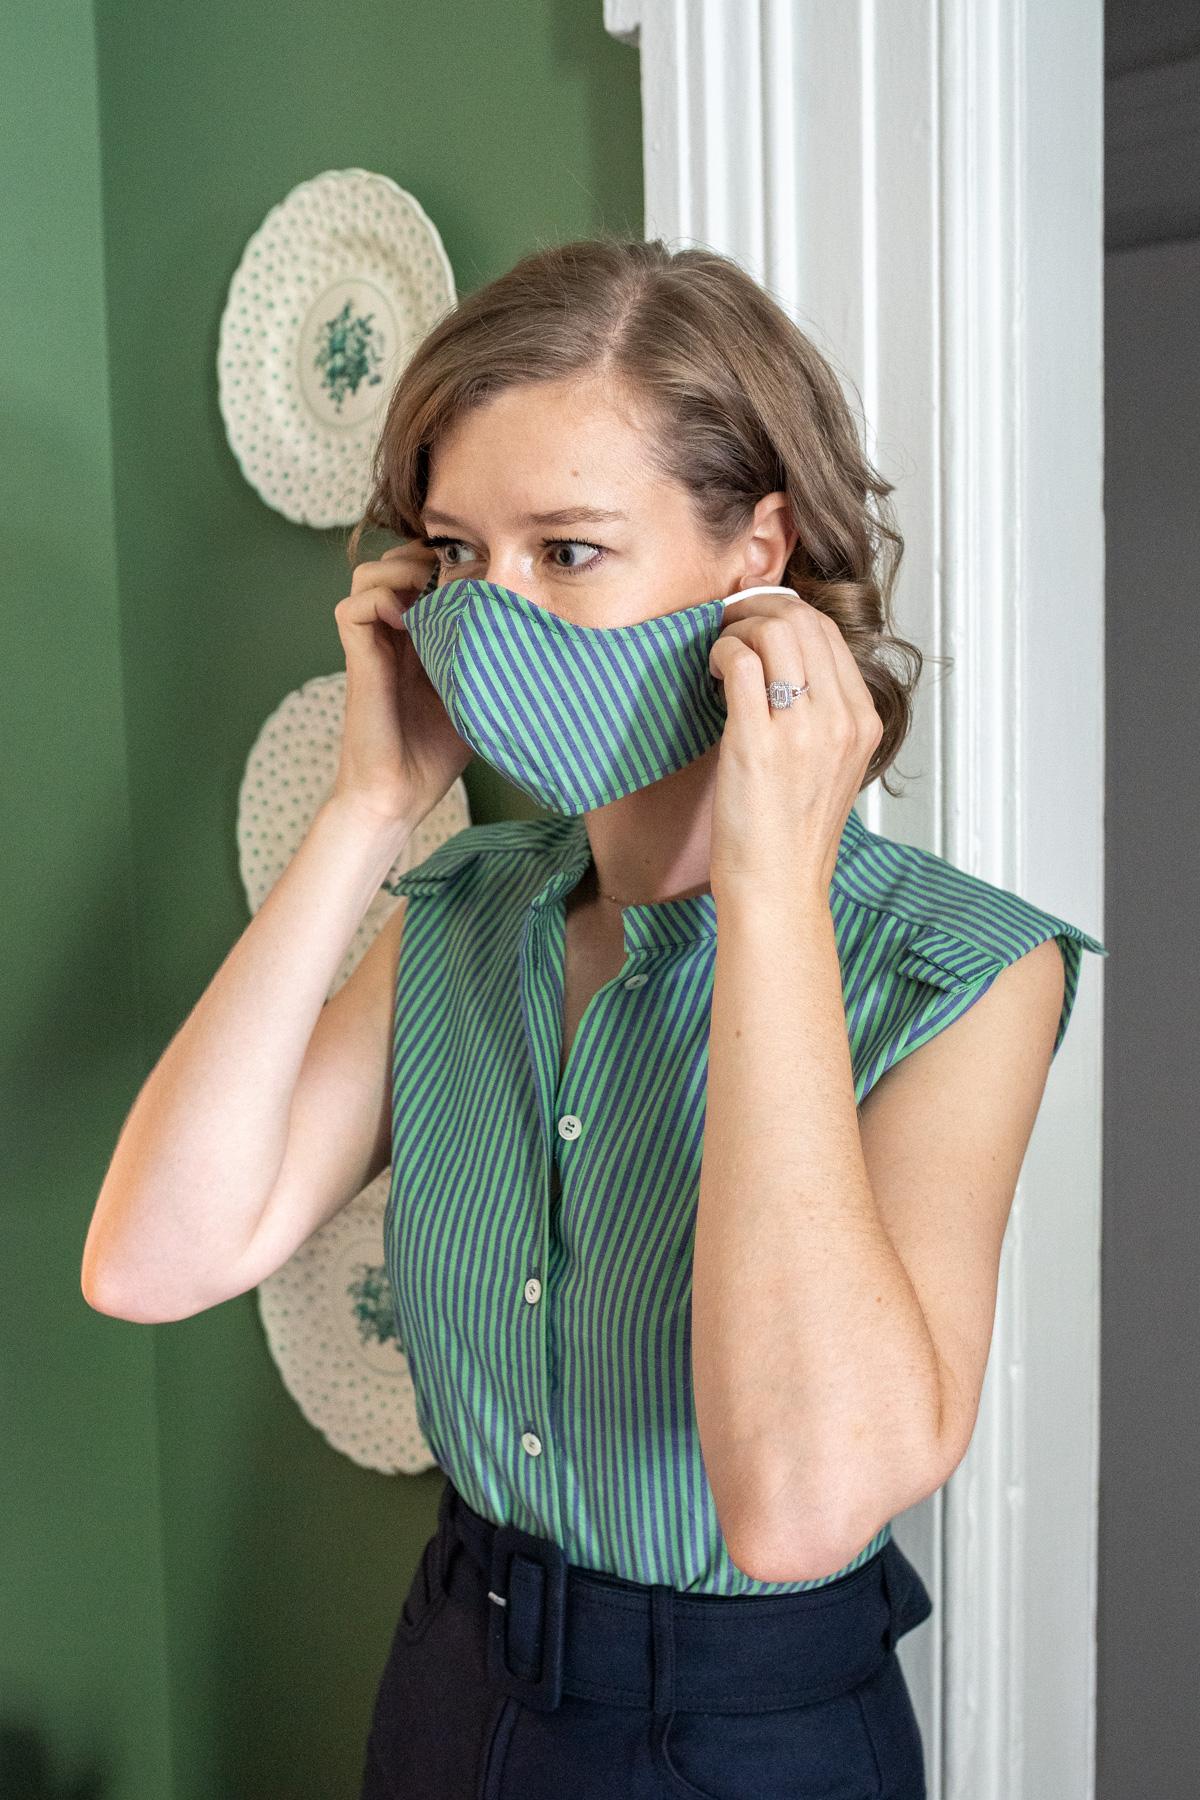 Stacie Flinner x Marta Scarampi Cotton Dress and Face mask-9.jpg